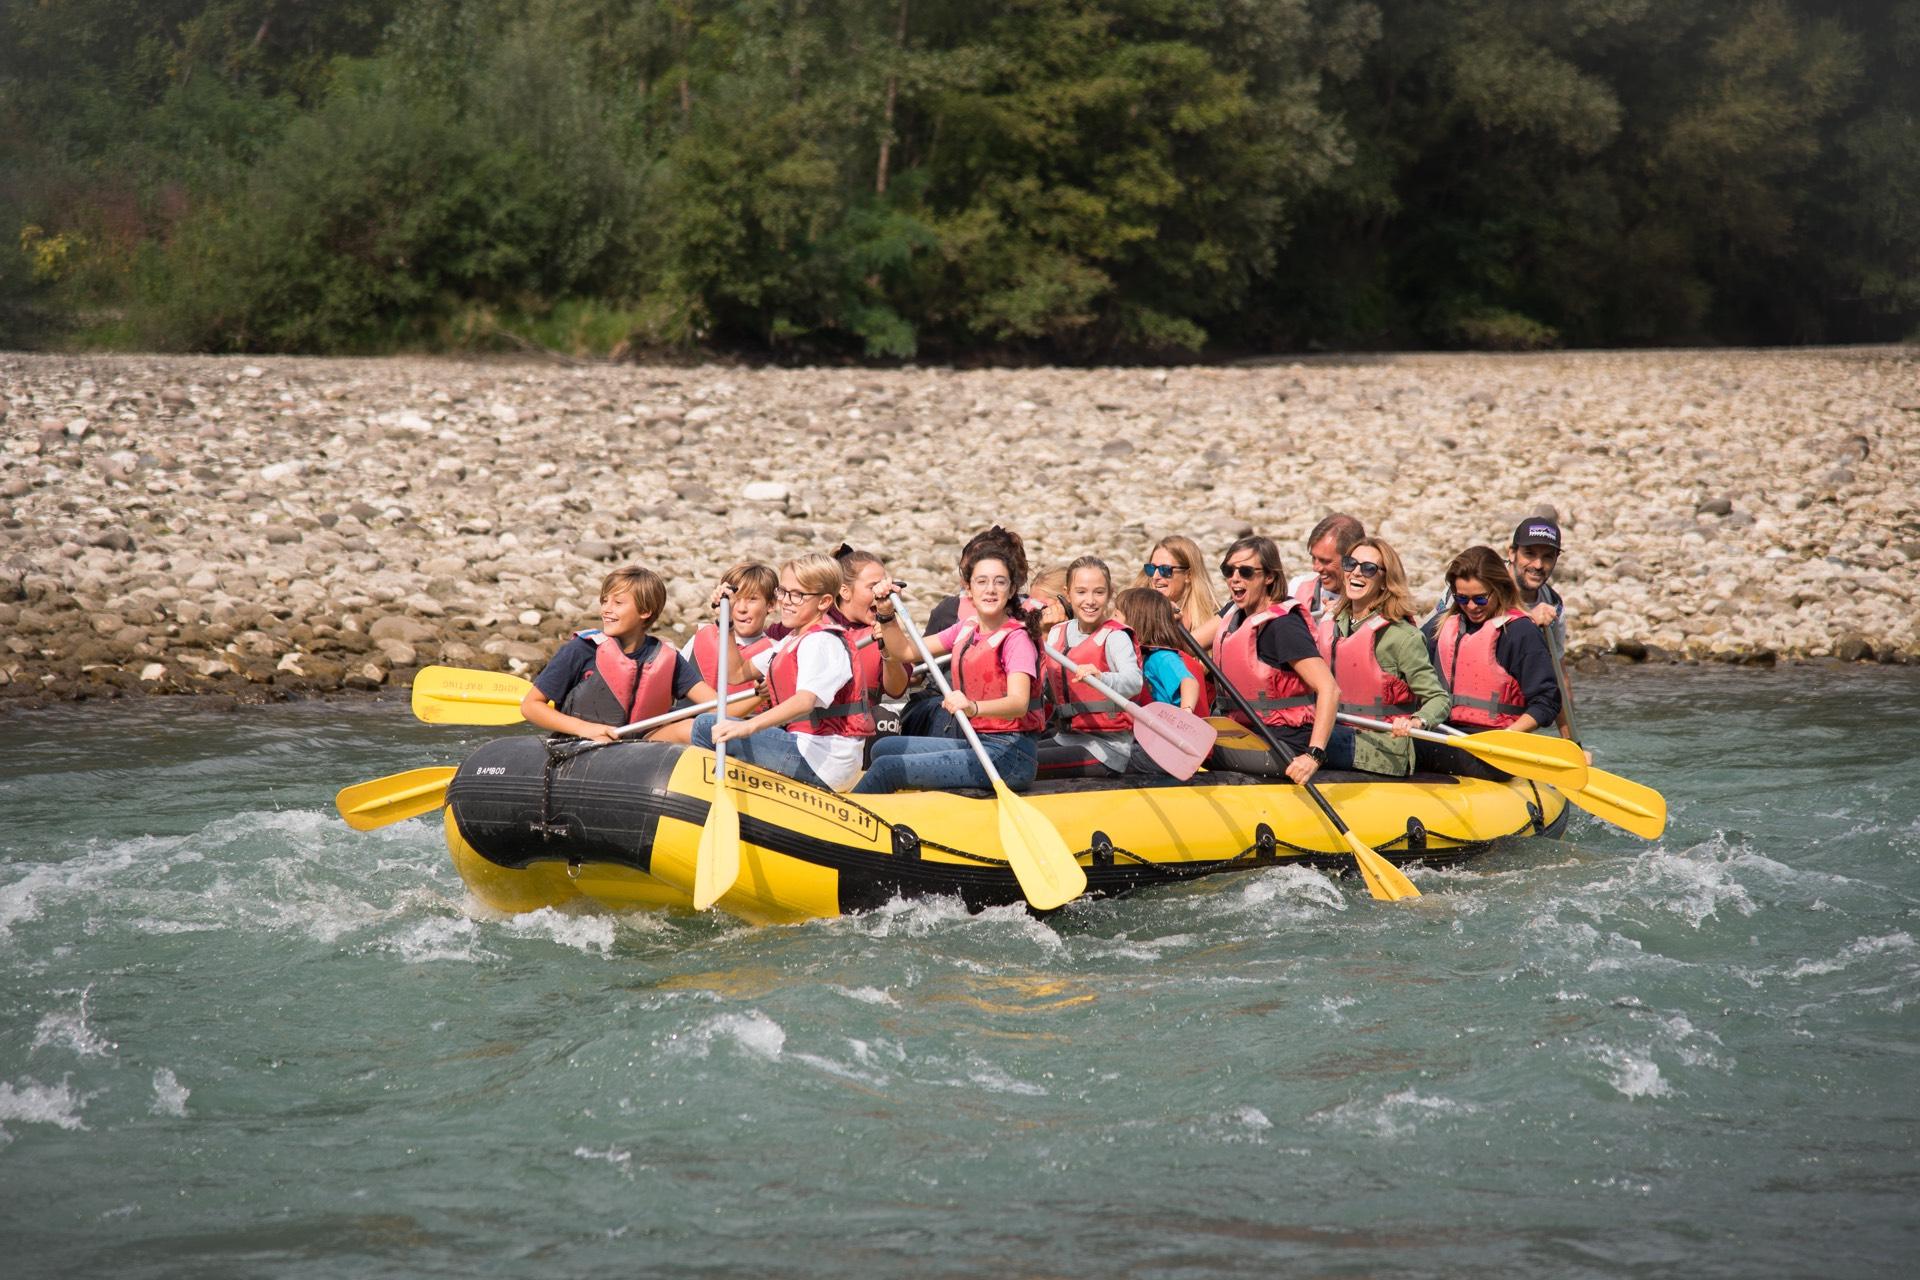 visitvaldadige tour sport cultura tra verona e adige visitvaldadigewine 13